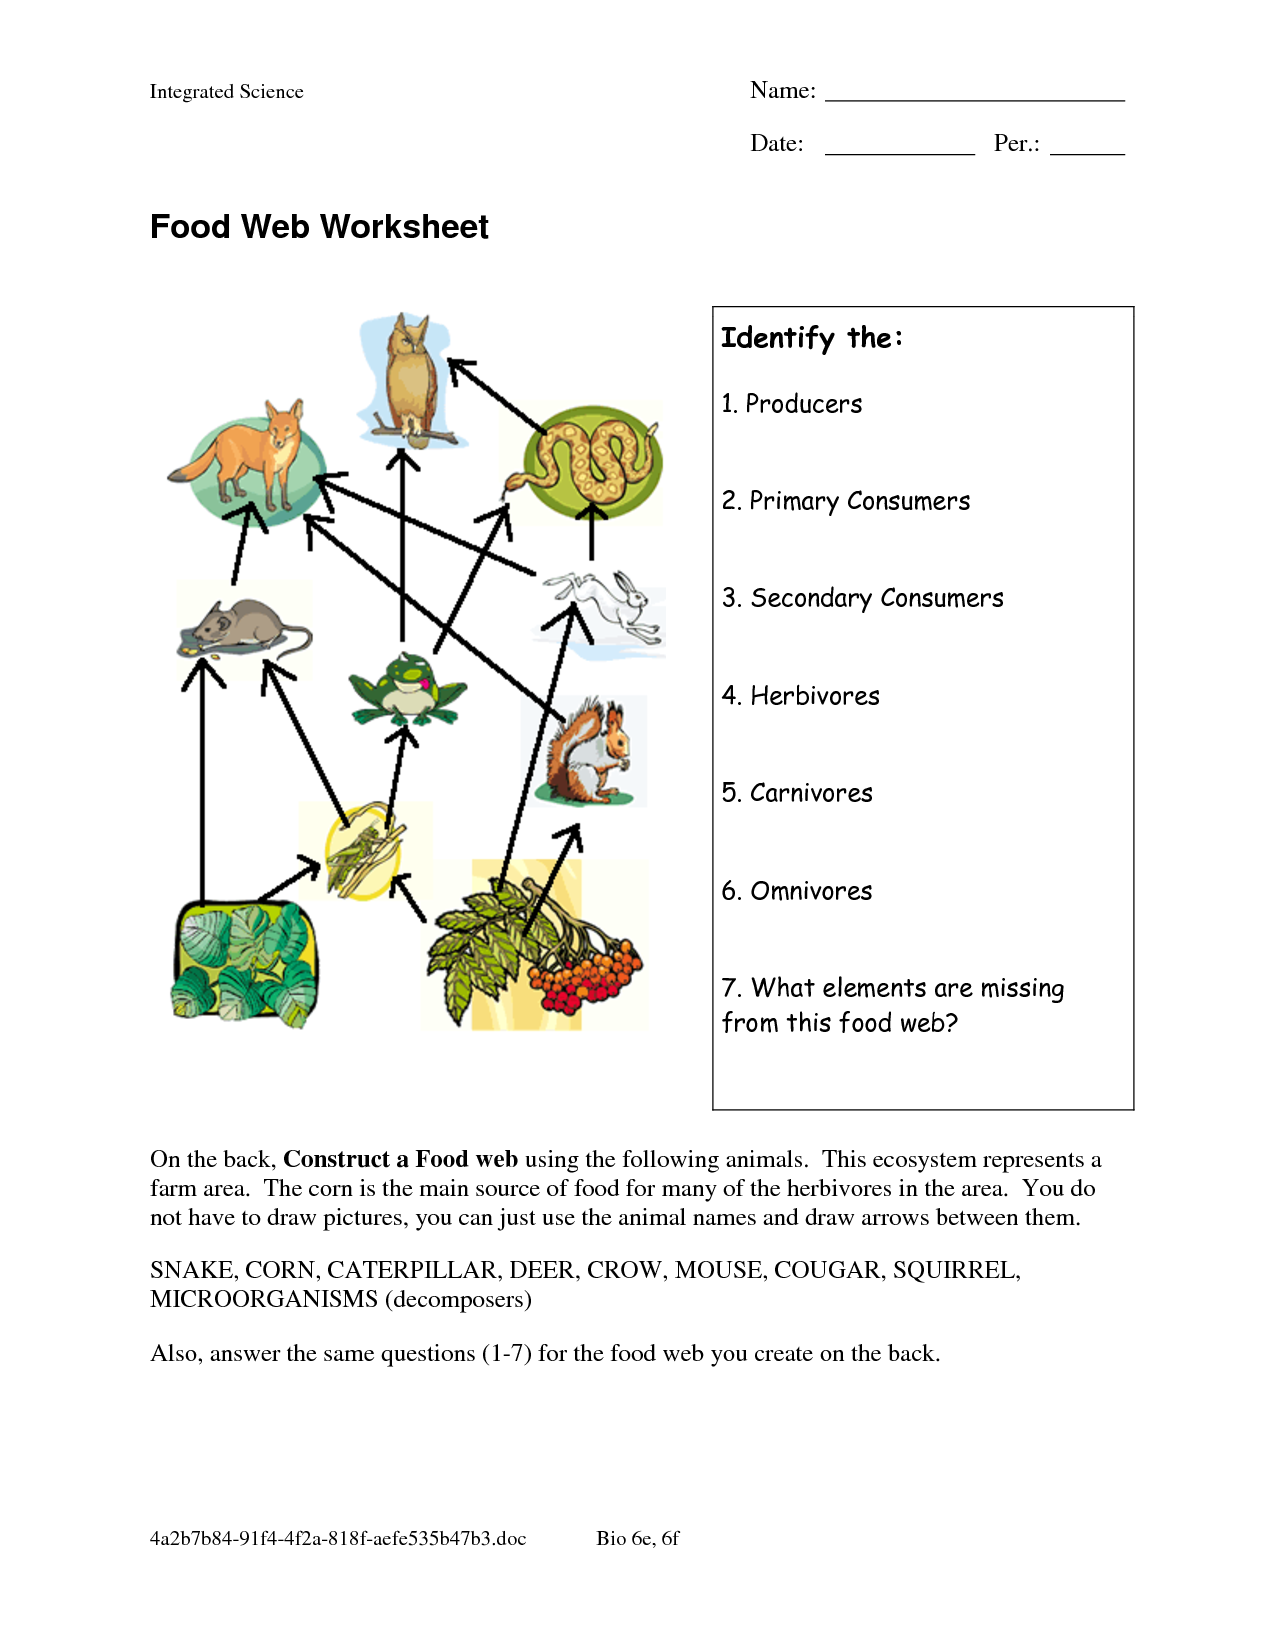 Food Web Worksheets   Food Web Worksheet - DOC   Food web worksheet [ 1650 x 1275 Pixel ]